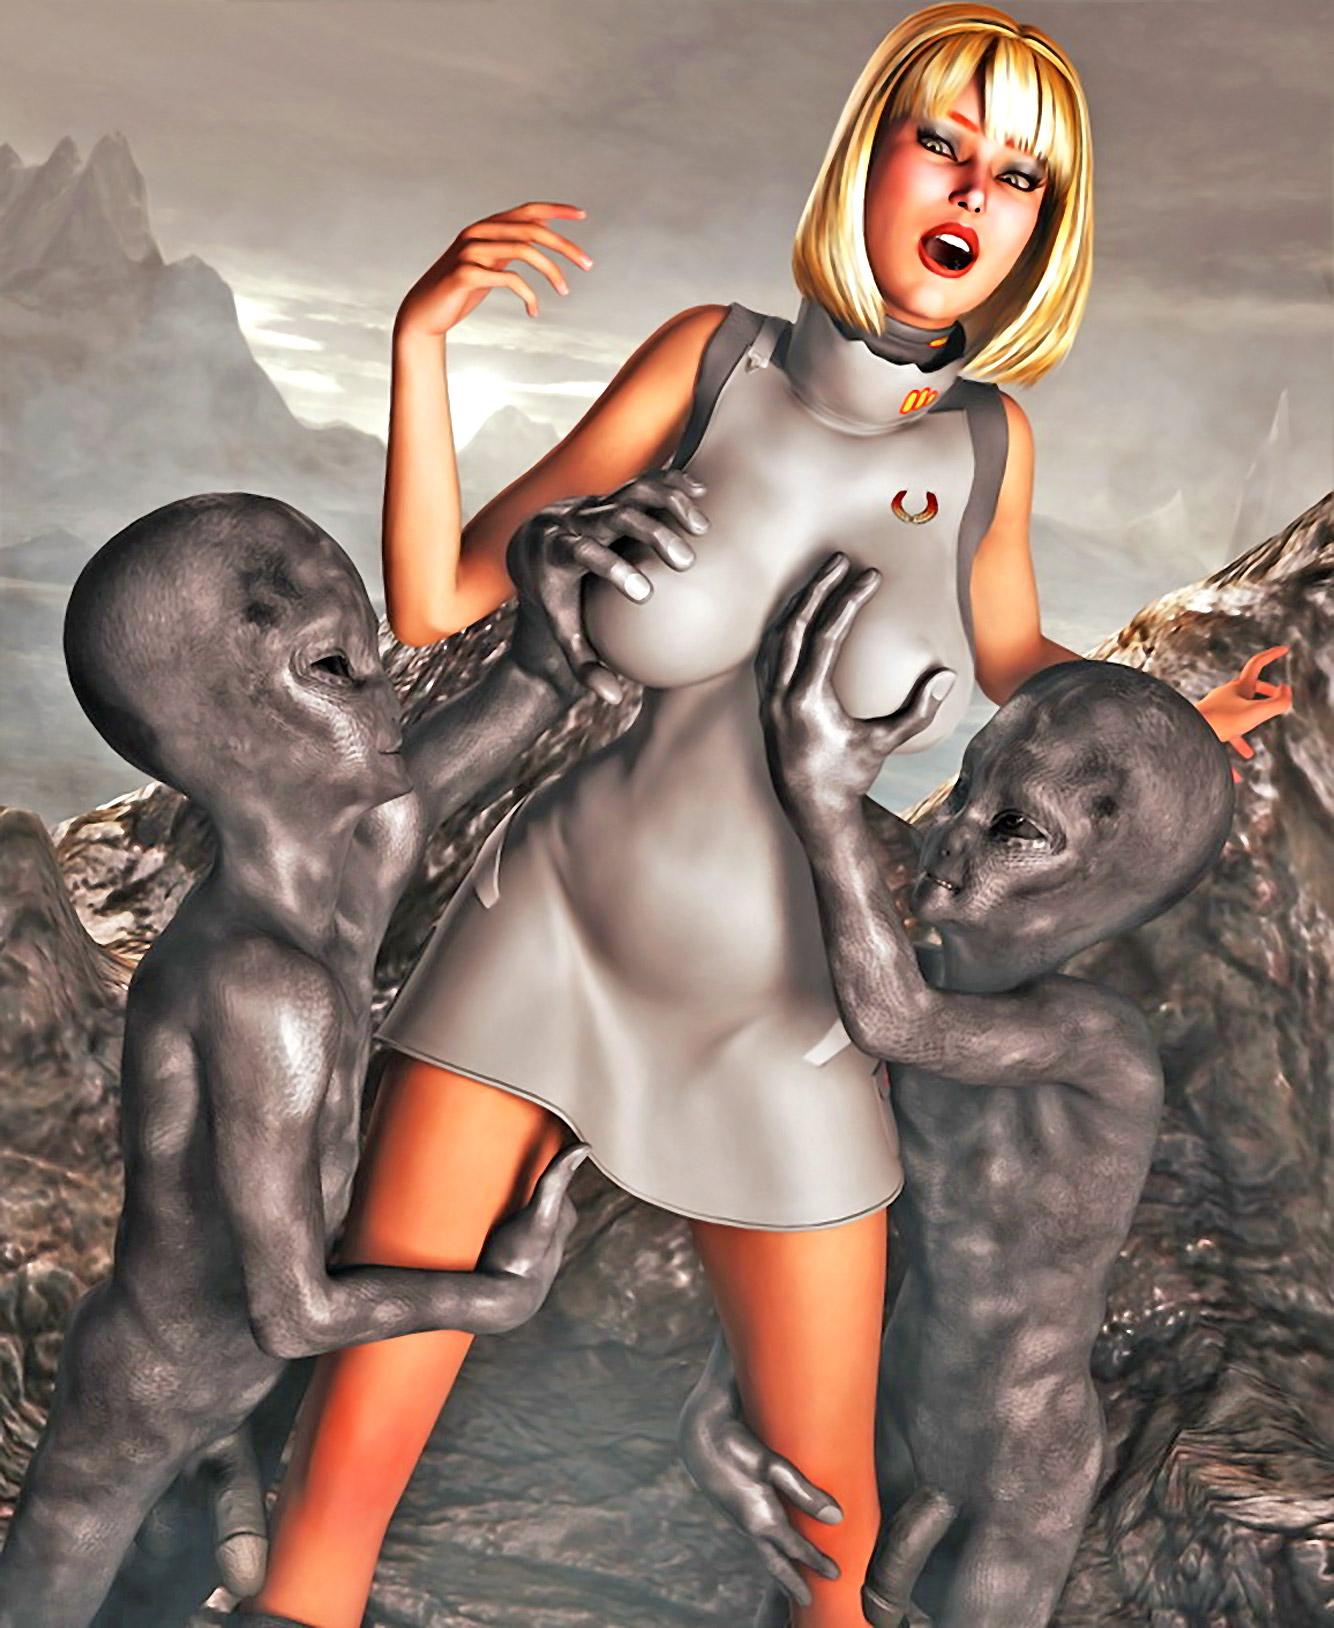 Zombie girl vs girl xxx naked clips